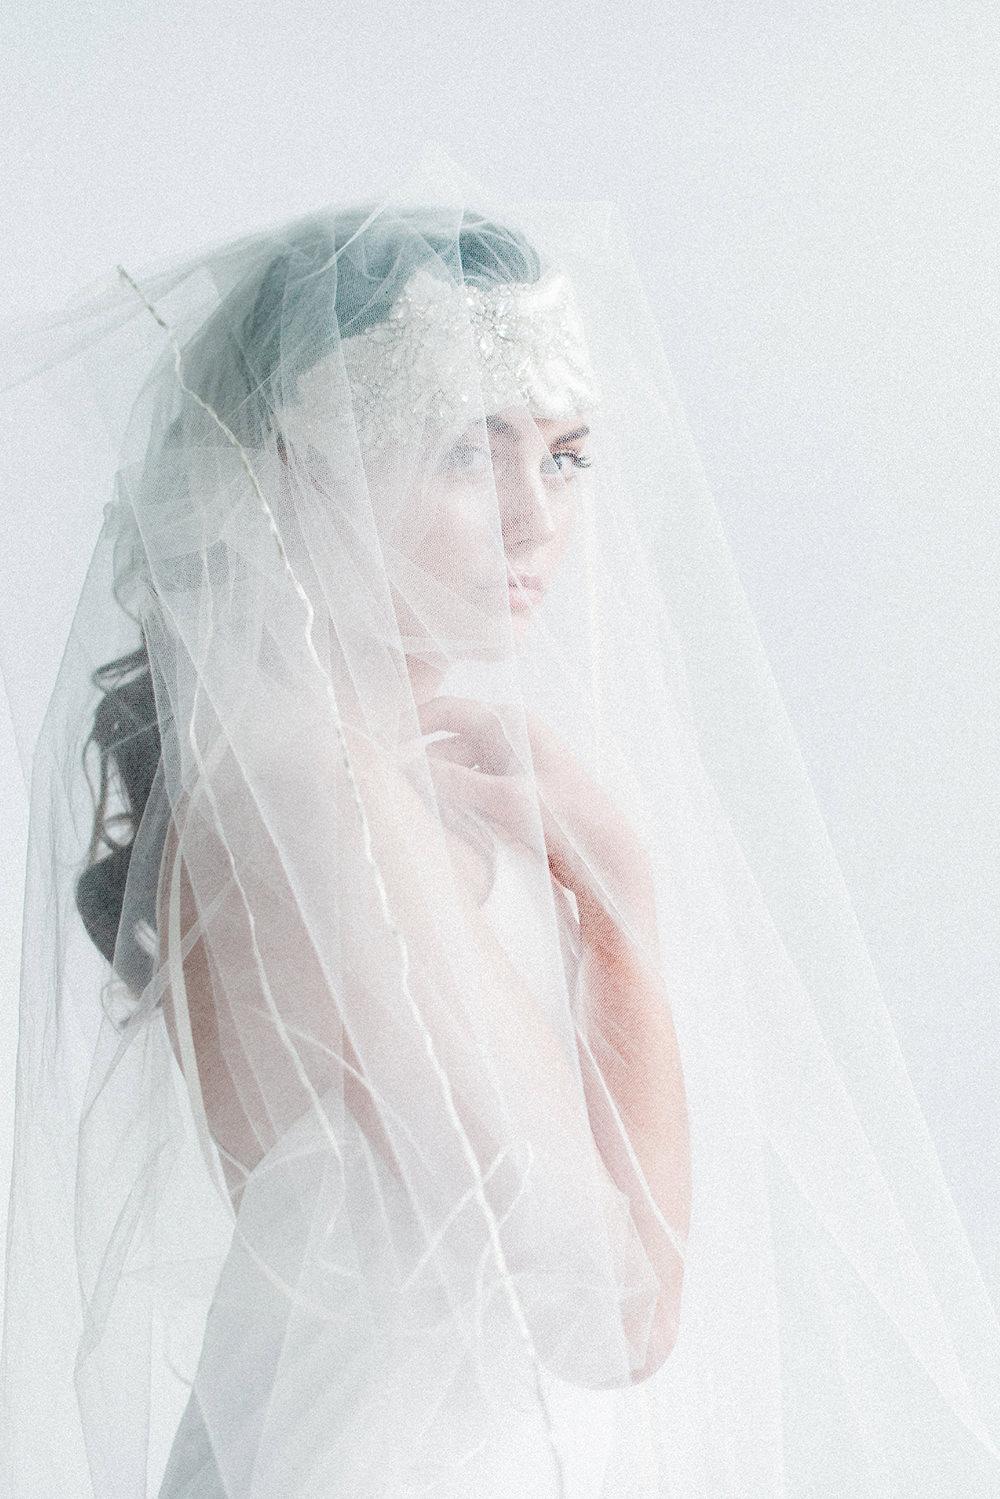 glam bridal inspiration - photo by Laura Kelly Photography http://ruffledblog.com/minimalist-monochrome-european-wedding-inspiration